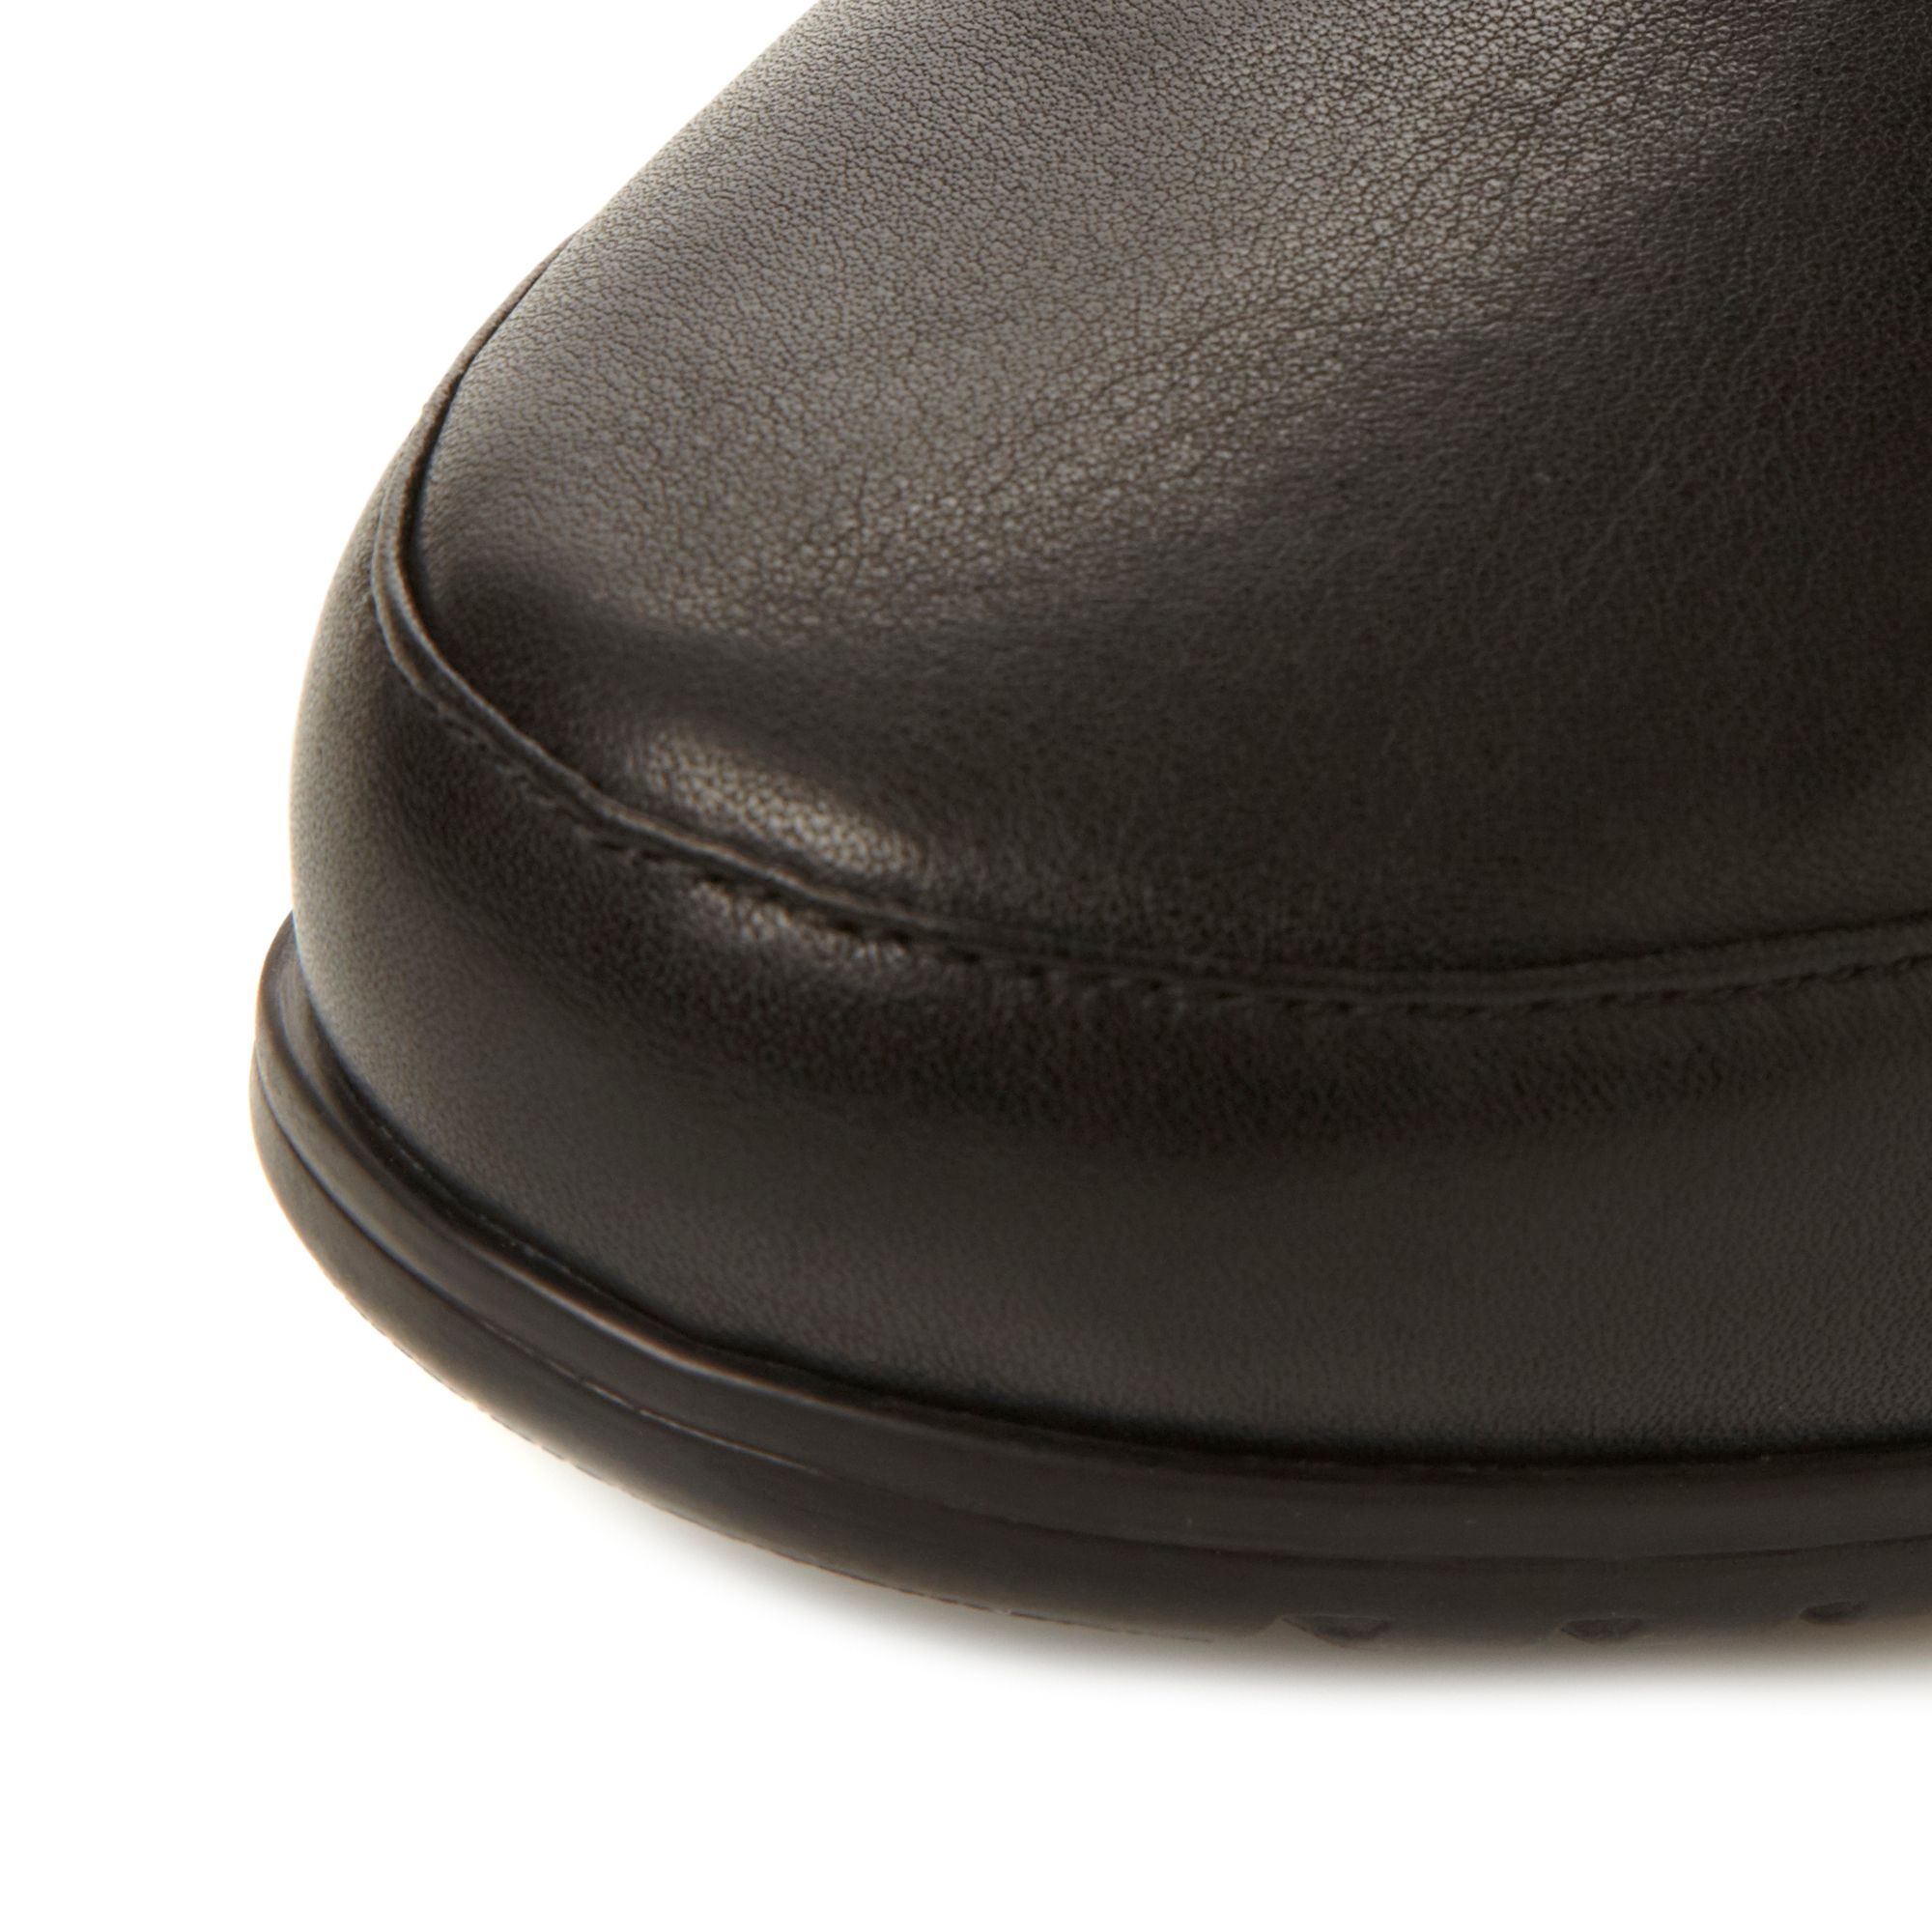 8e0d4e73301 Fitflop Due Stretch Boot